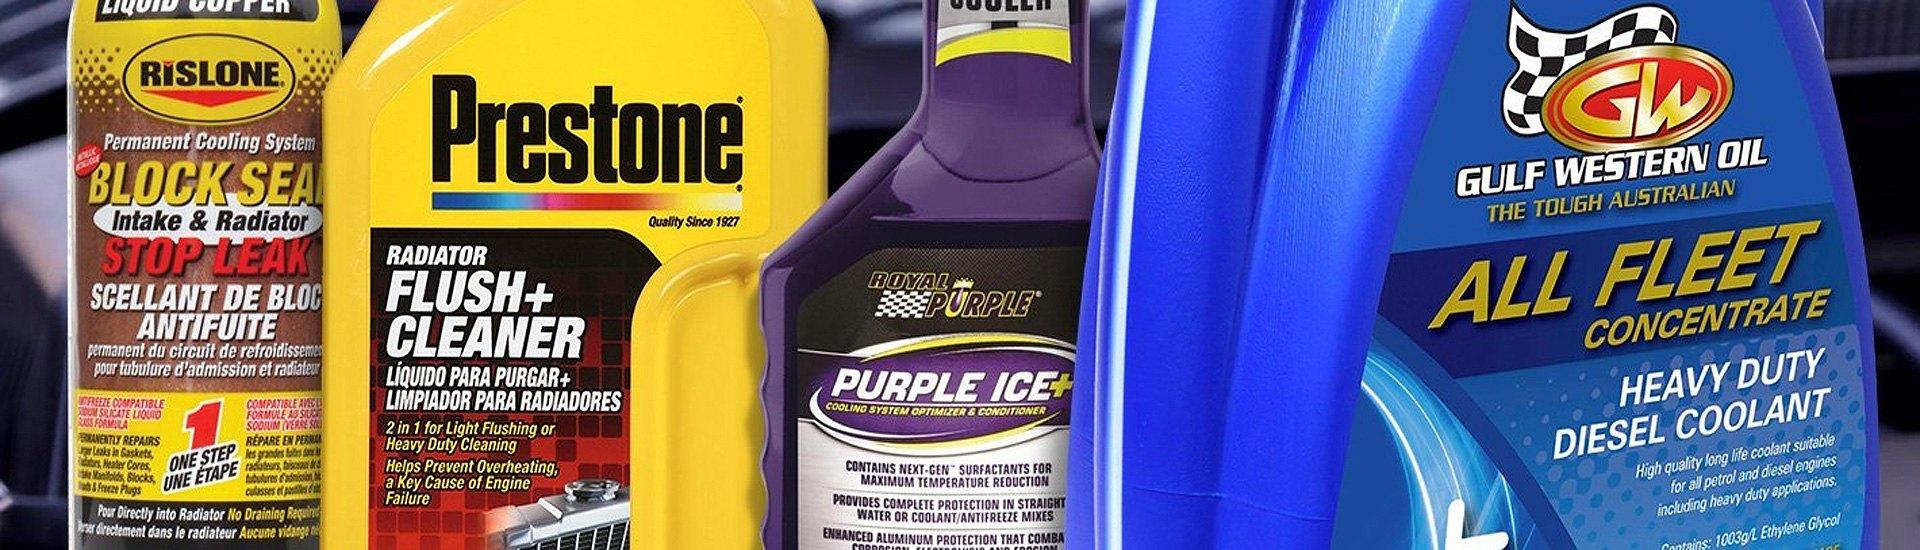 PRESTONE Dex-Cool Anitfreeze/Coolant Concentrate, 1gal - Walmart ... | 550x1920